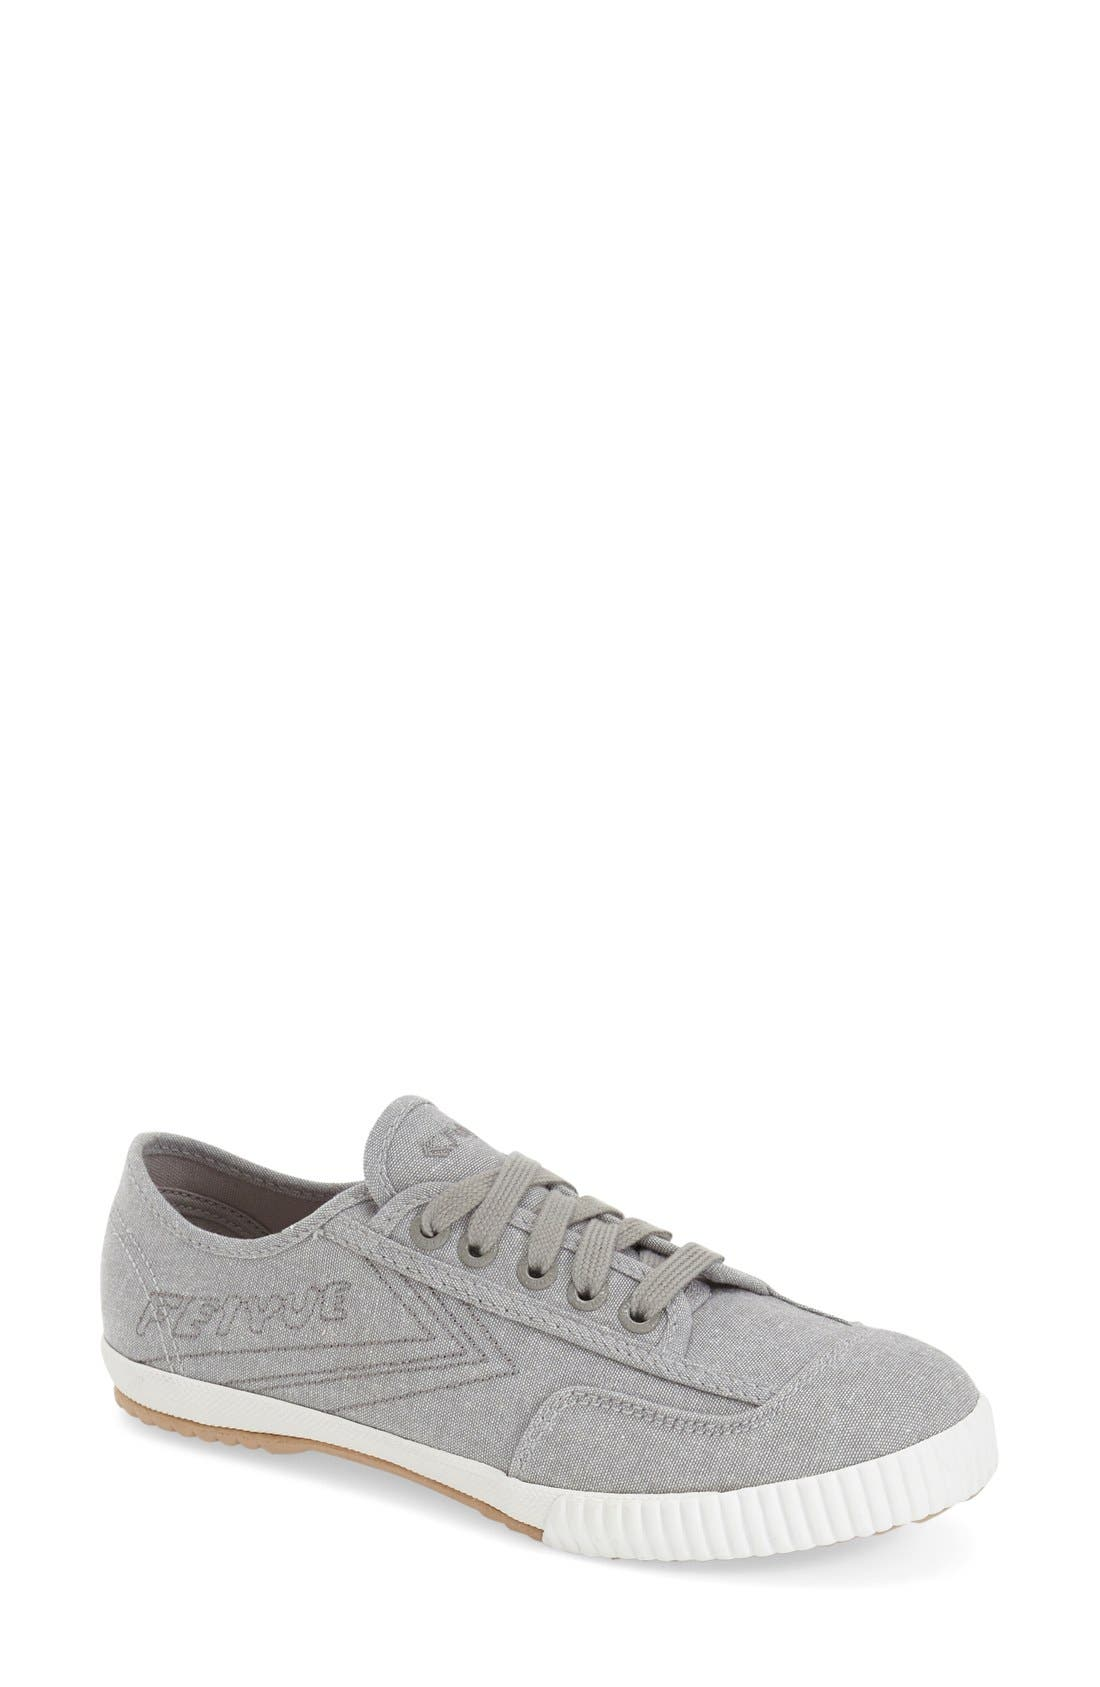 FEIYUE. 'Fe Lo Plain' Chambray Sneaker